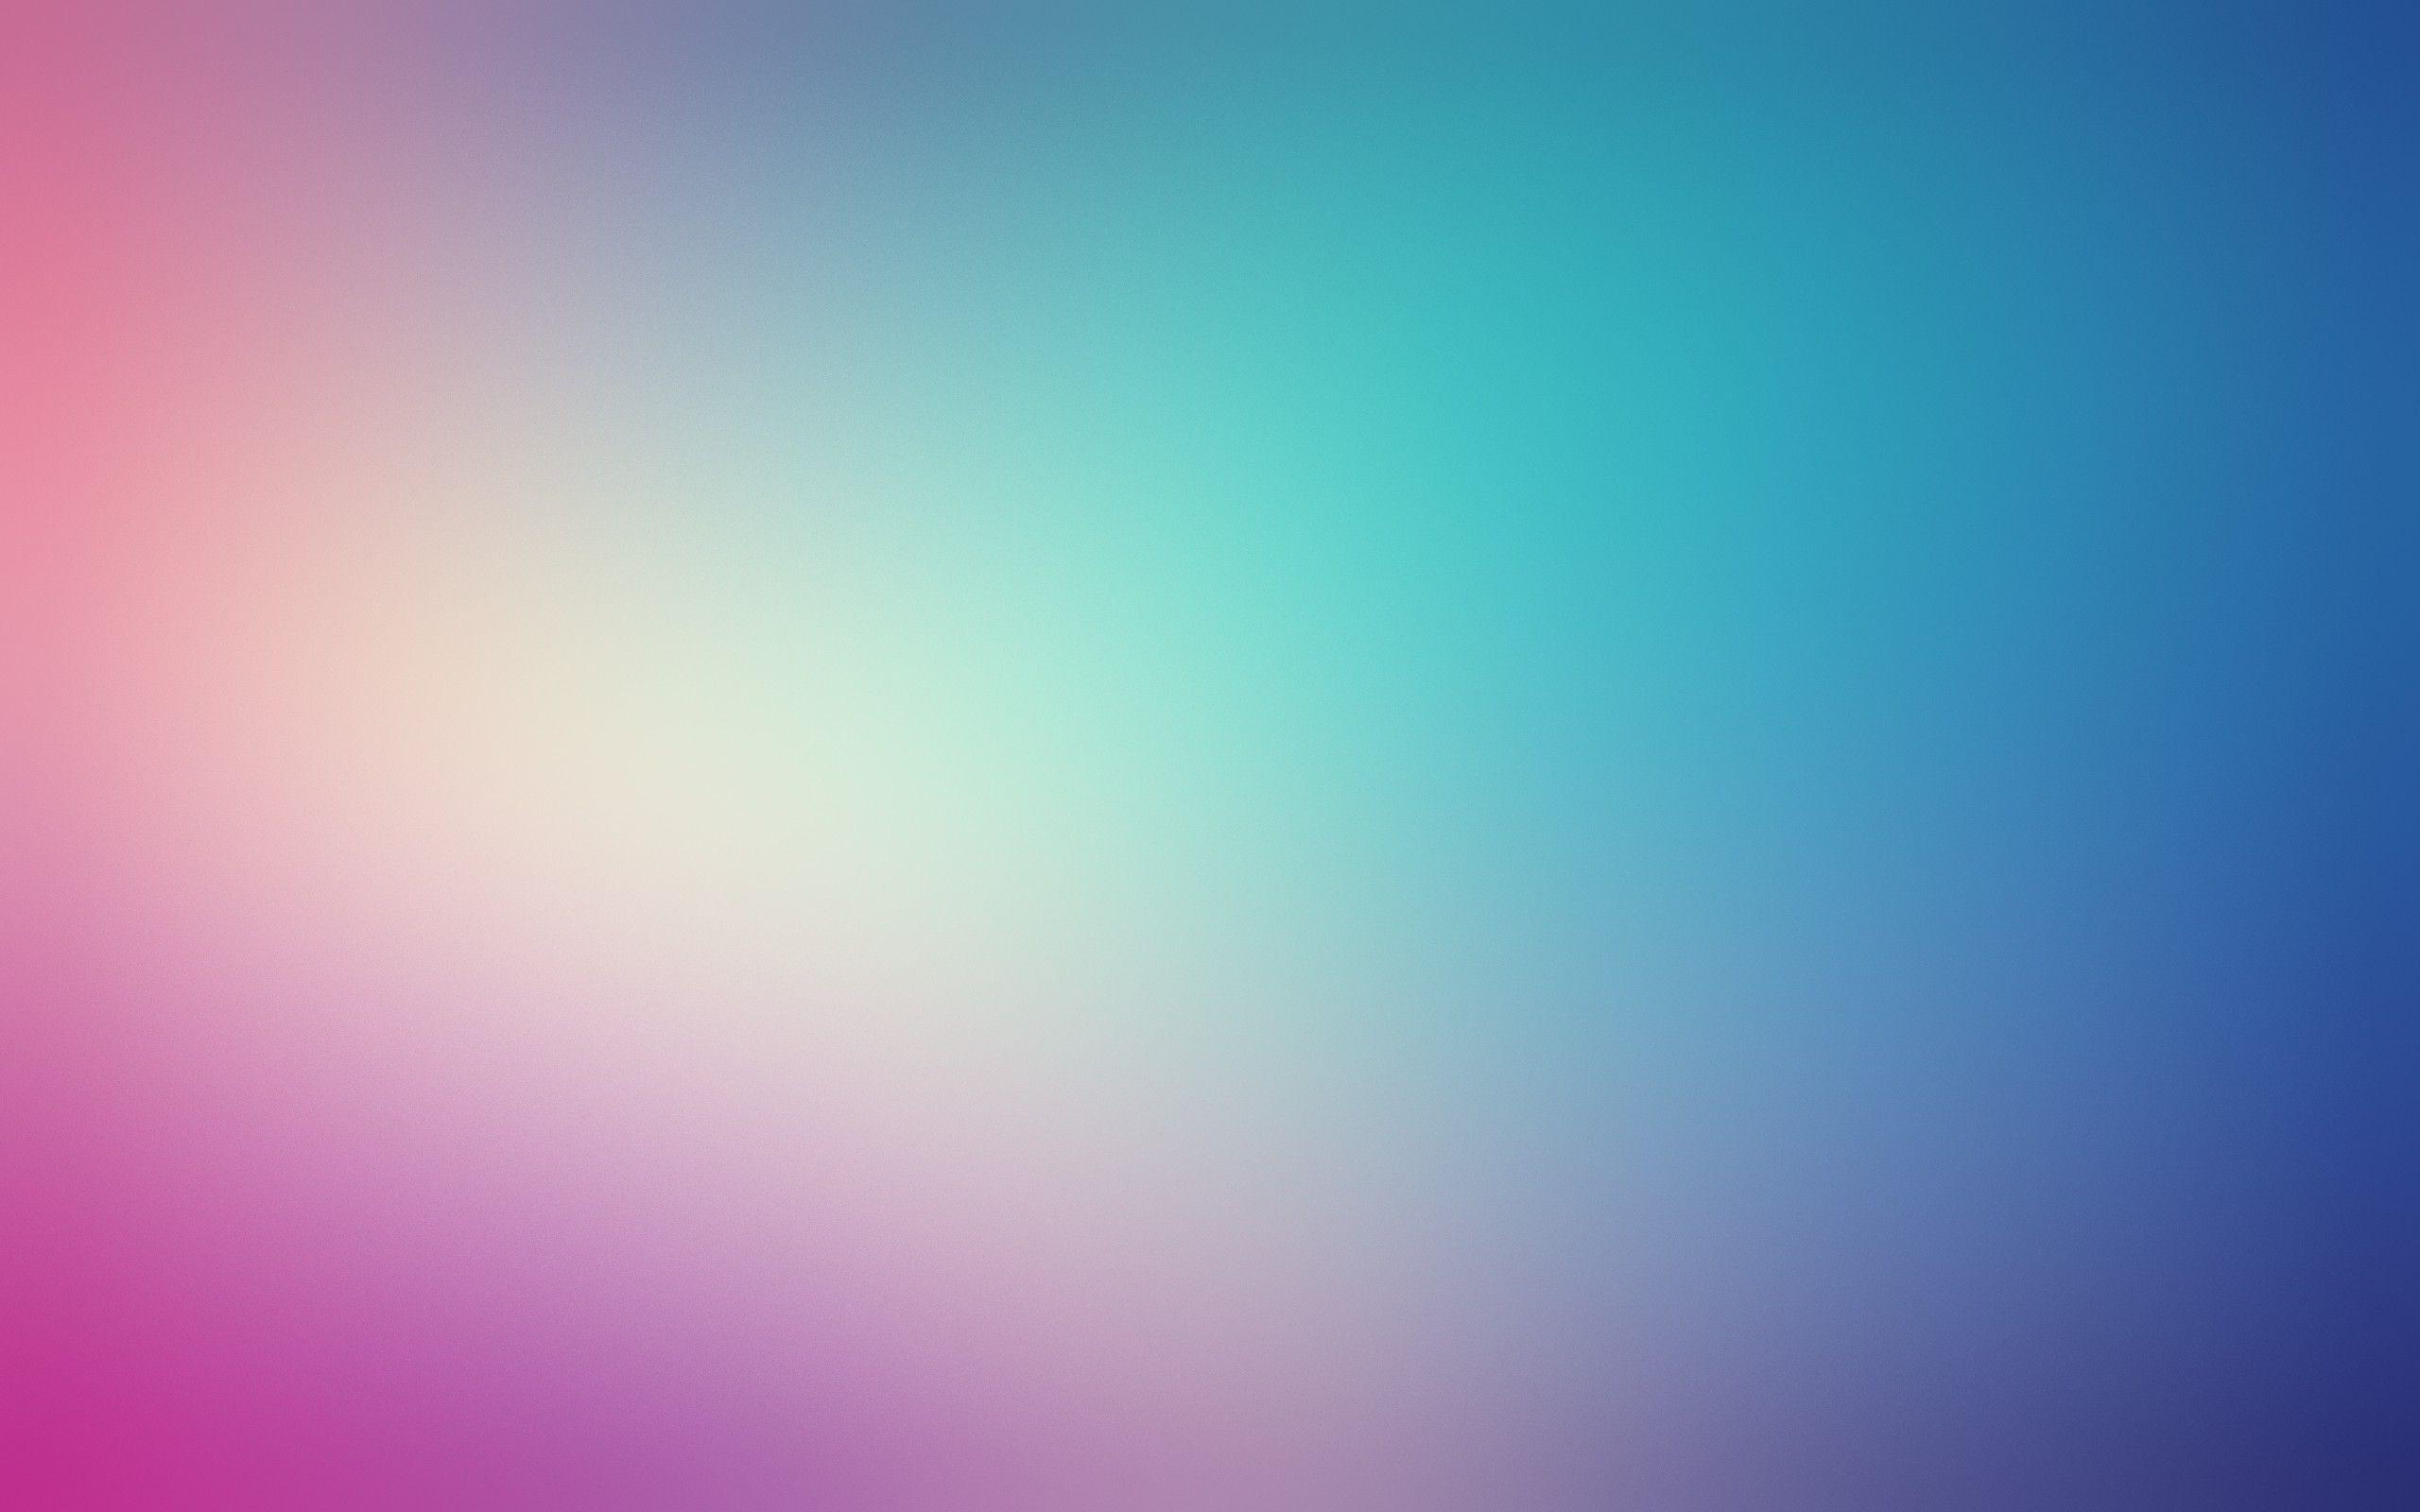 Color Gradient Wallpaper   Data-src /full/1155011 - Full Hd Simple Background , HD Wallpaper & Backgrounds